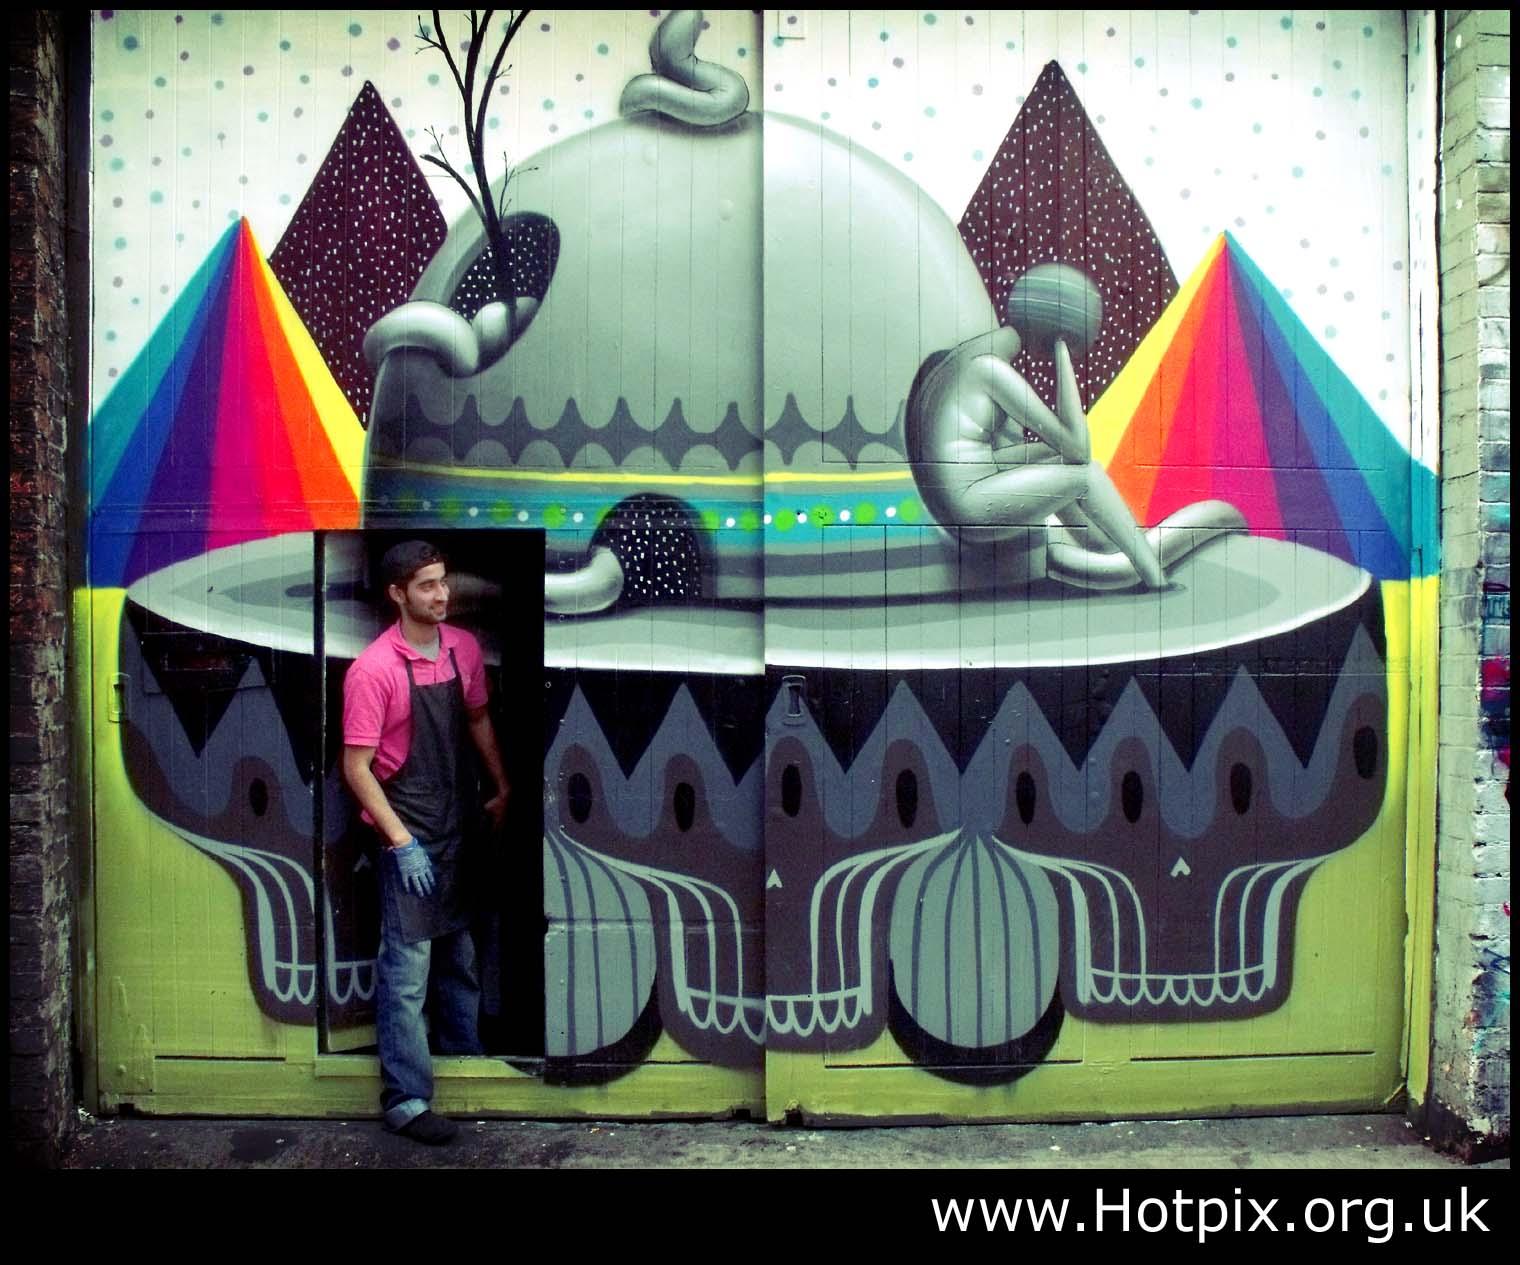 tony,smith,tonysmith,hotpix,tonysmithhotpix,tonysmithotpix,UK,UFO,manchester,grafitti,gafitti,painting,oxford,rd,road,England,man,stepping,from,door,alien,alian,urban,art,urbanart,street,streetart,HDR,Mancunian,mancunia,station,bar,M1,M62